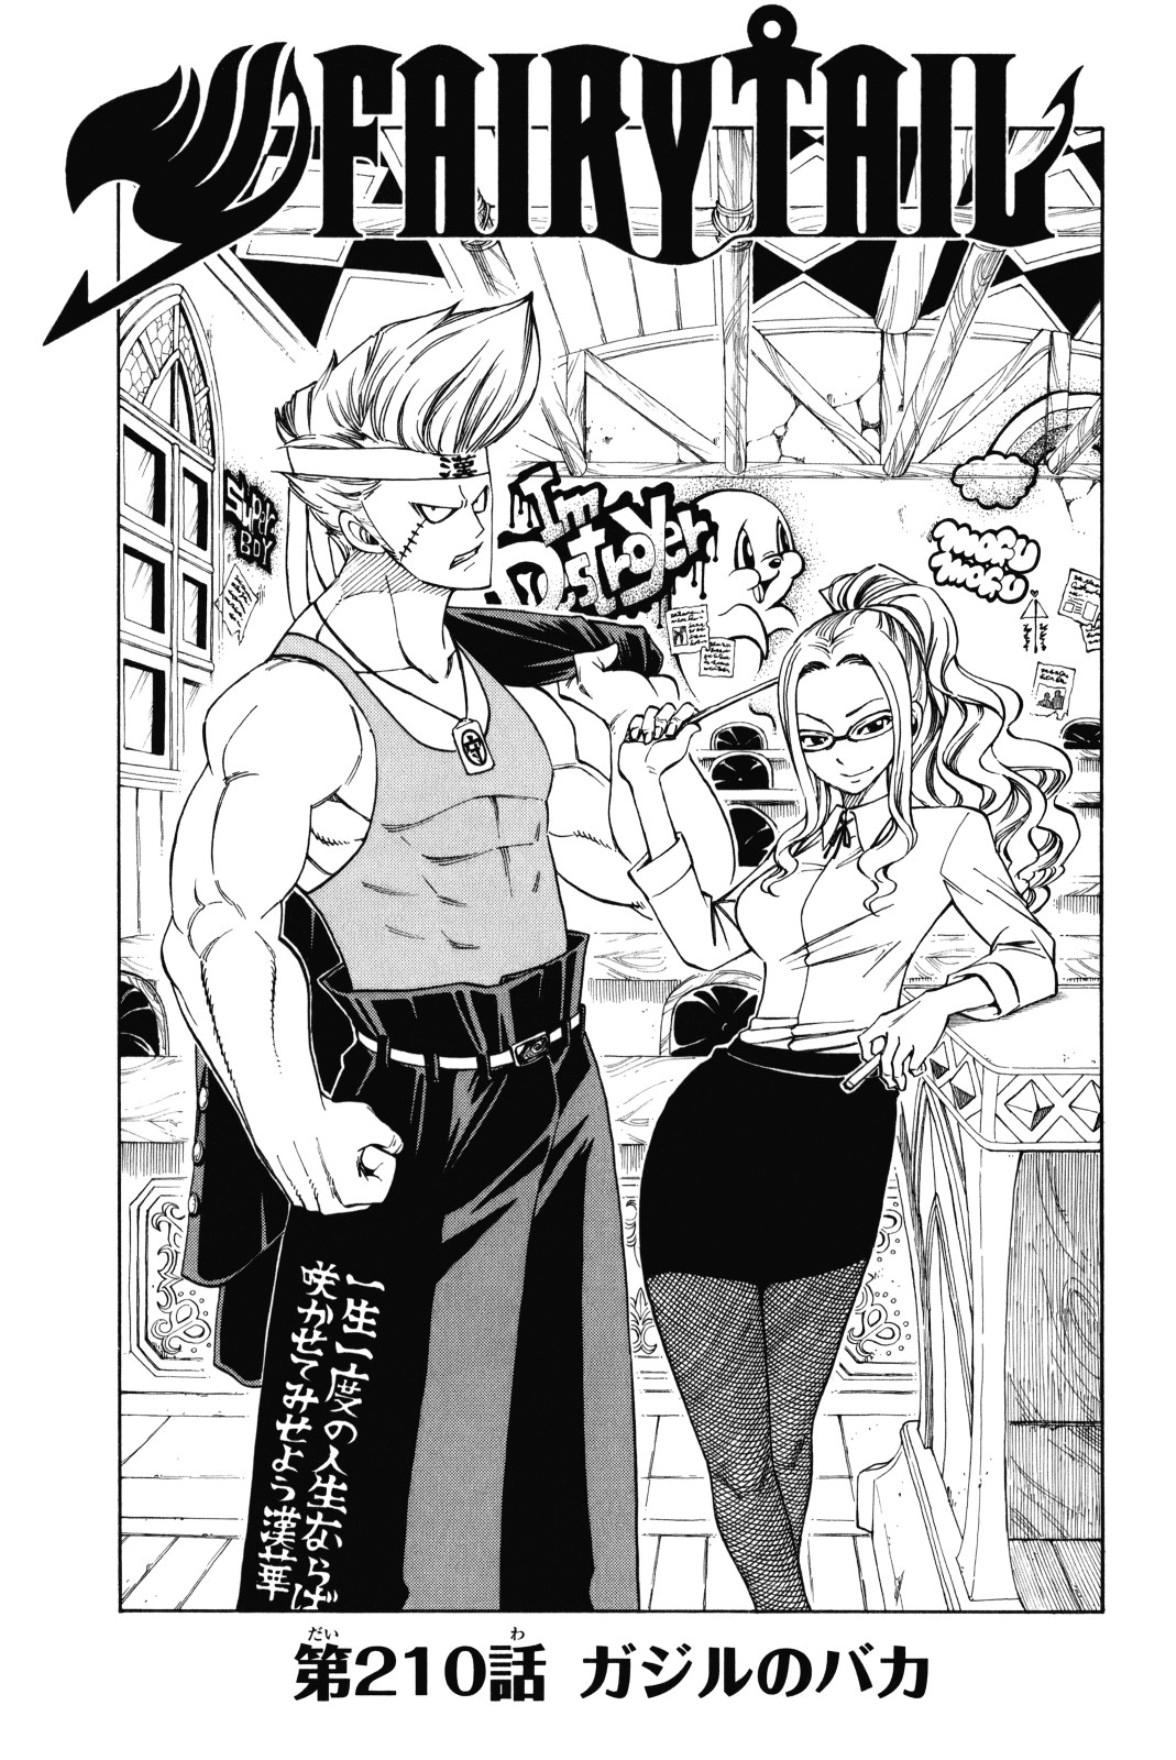 Chapter 210 Fairy Tail Wiki Fandom Home community anime/manga fairy tail miraxus, lami, mirajane x laxus dreyar. chapter 210 fairy tail wiki fandom